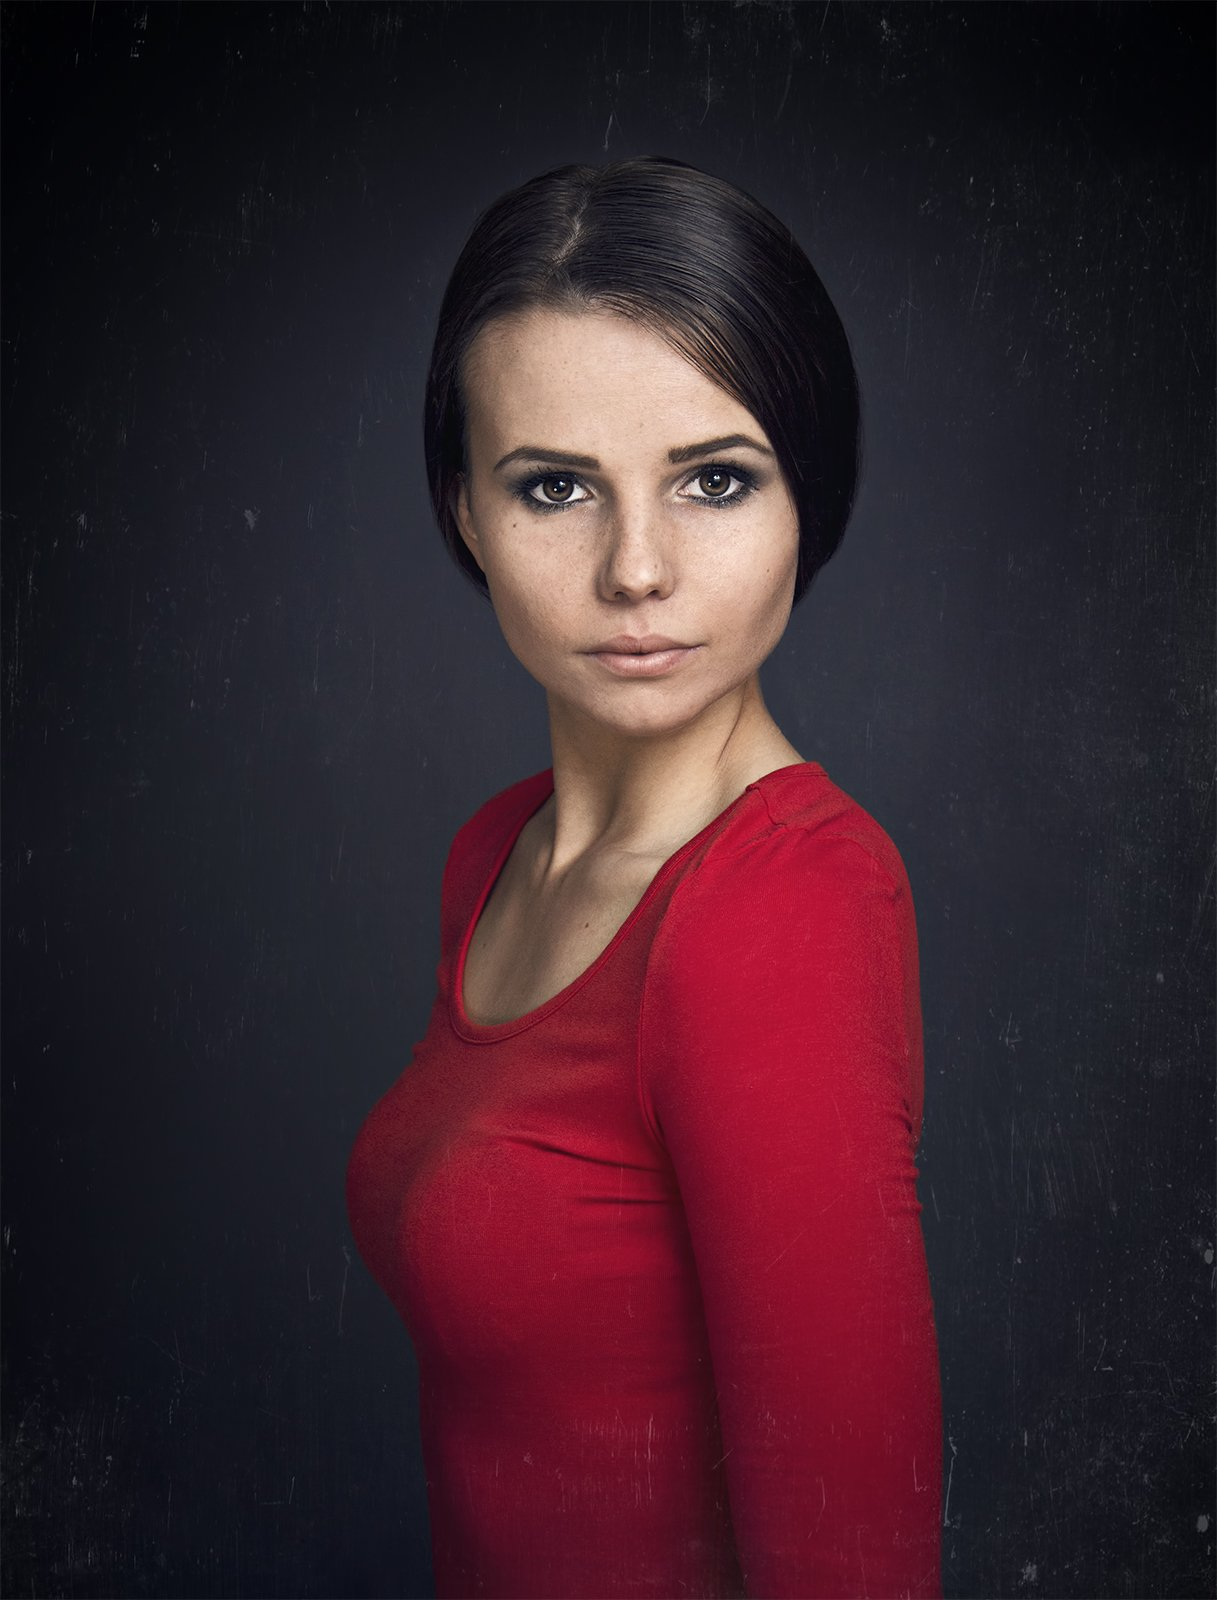 portrait, petra, петра, jozefkiss, nikon photography, Jozef Kiss